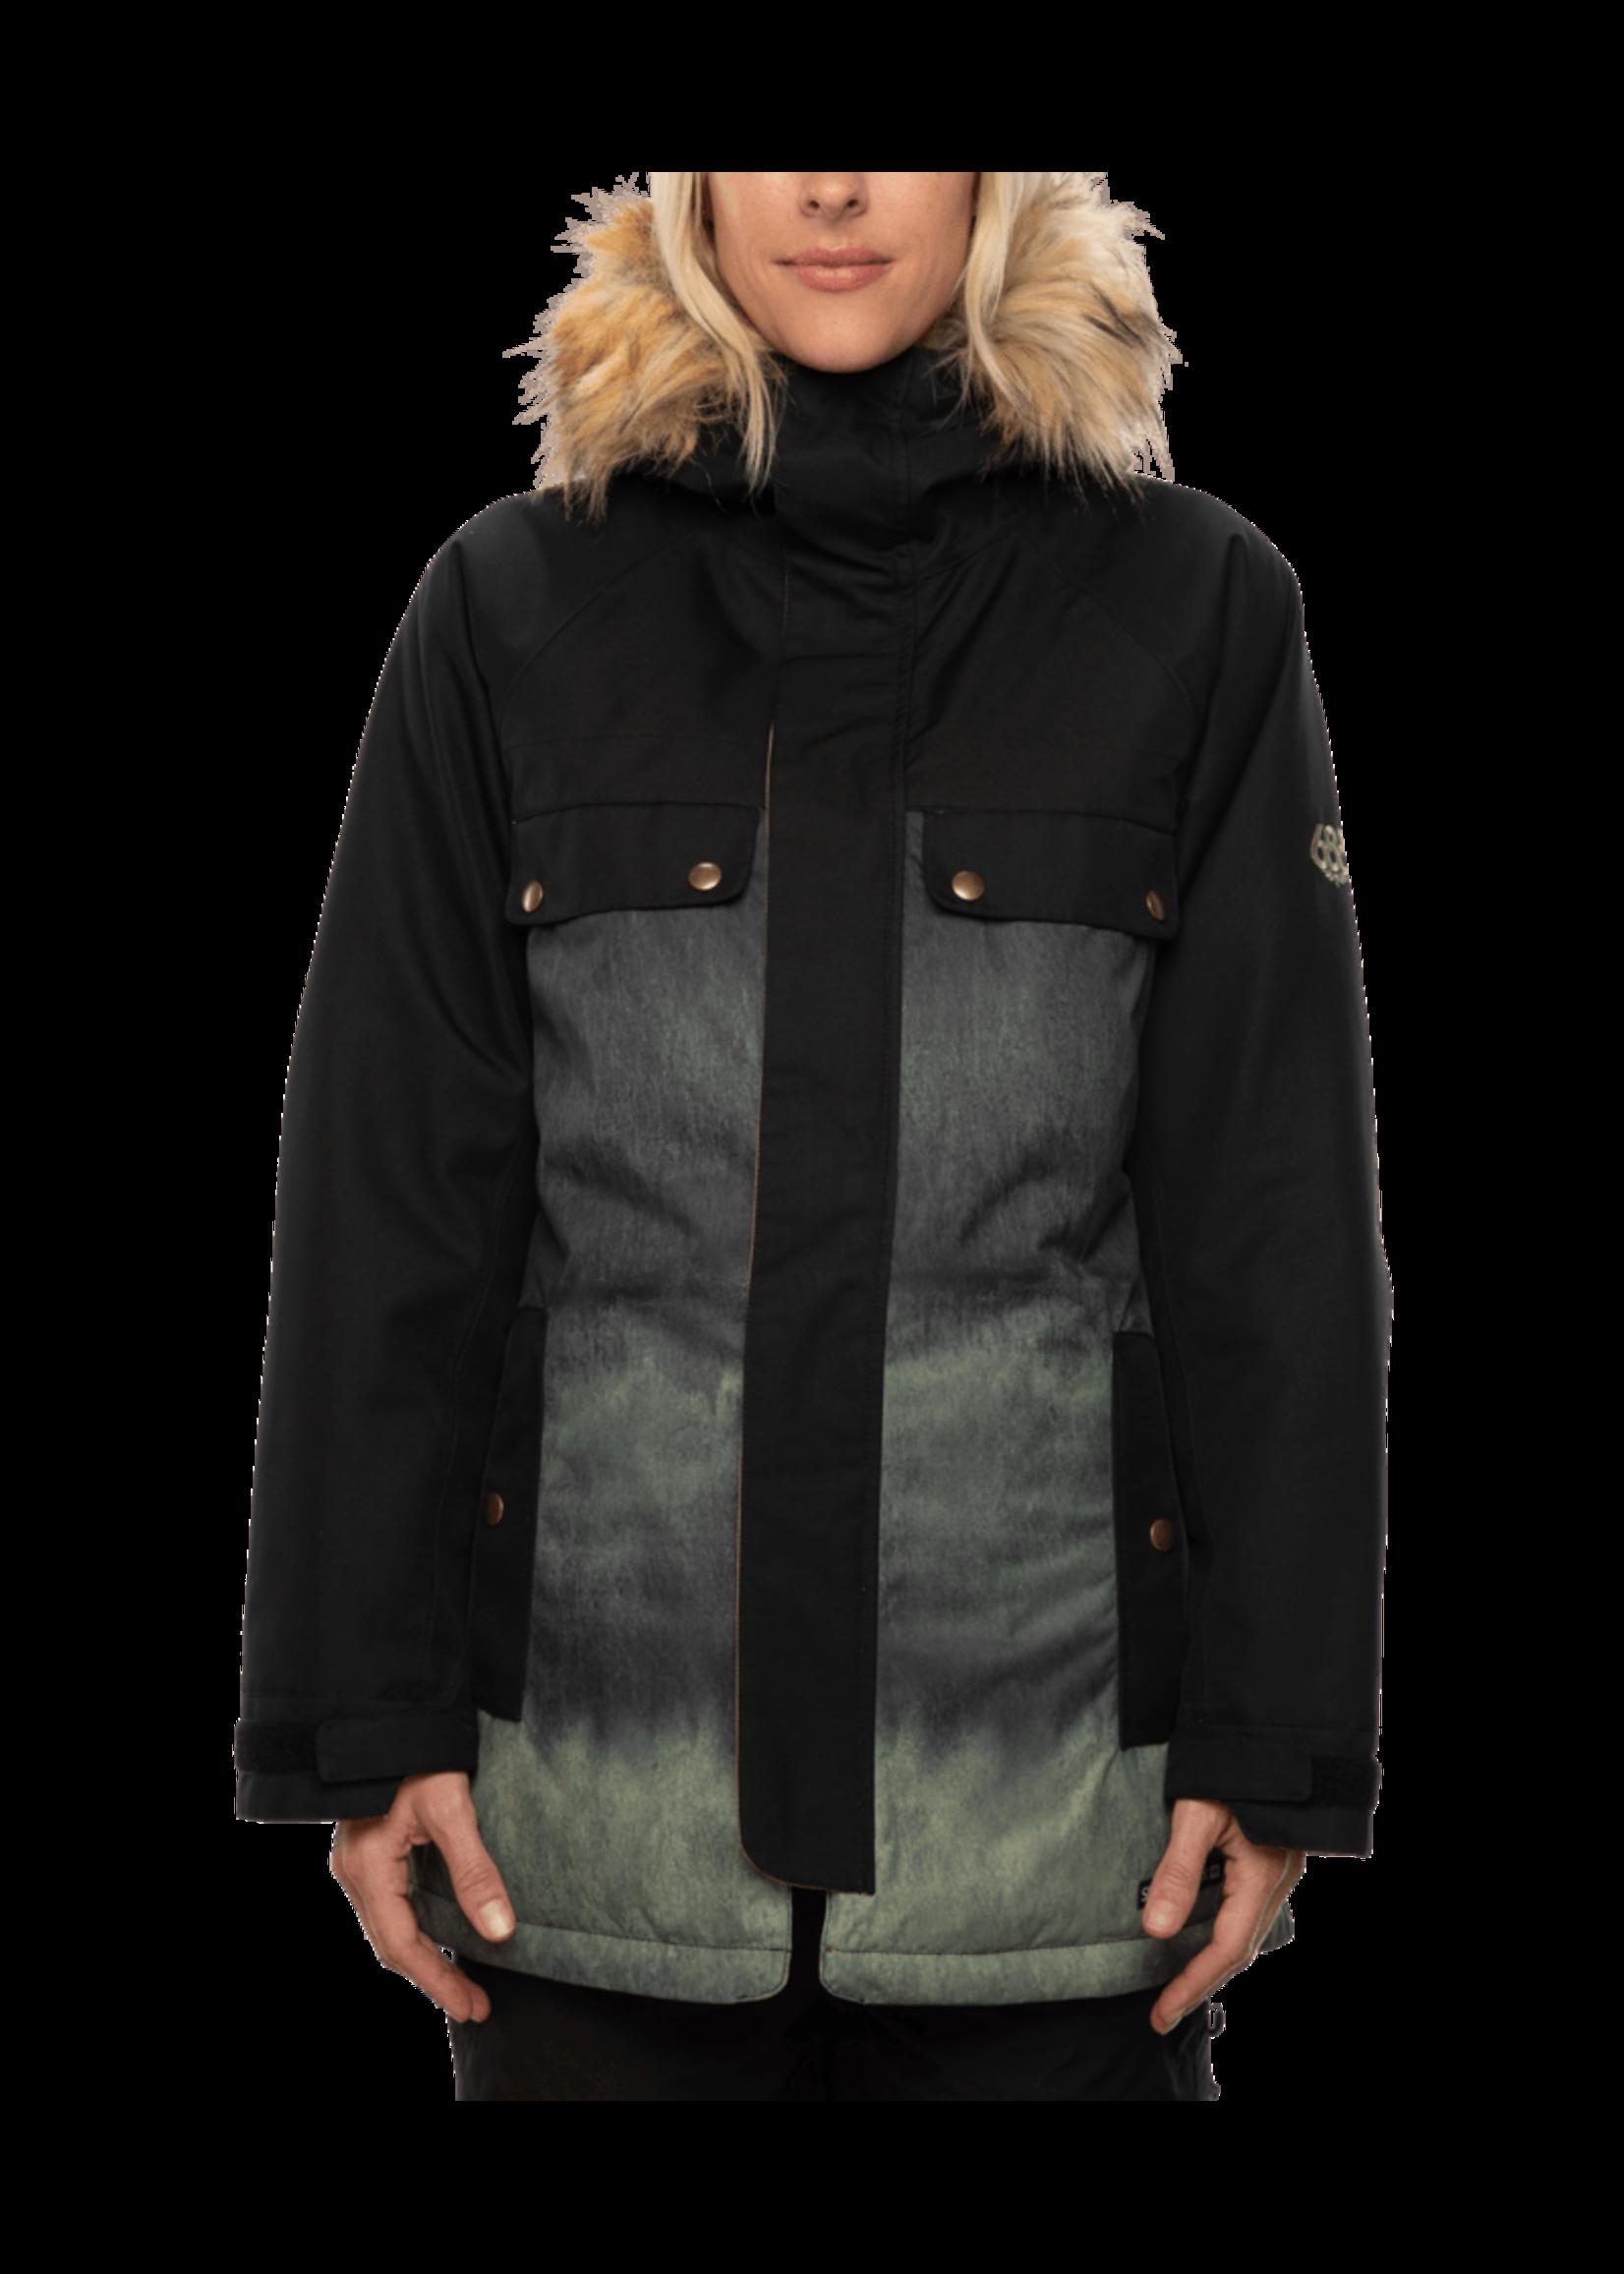 686 686 Dream Insulated Jacket Moss Fade Medium